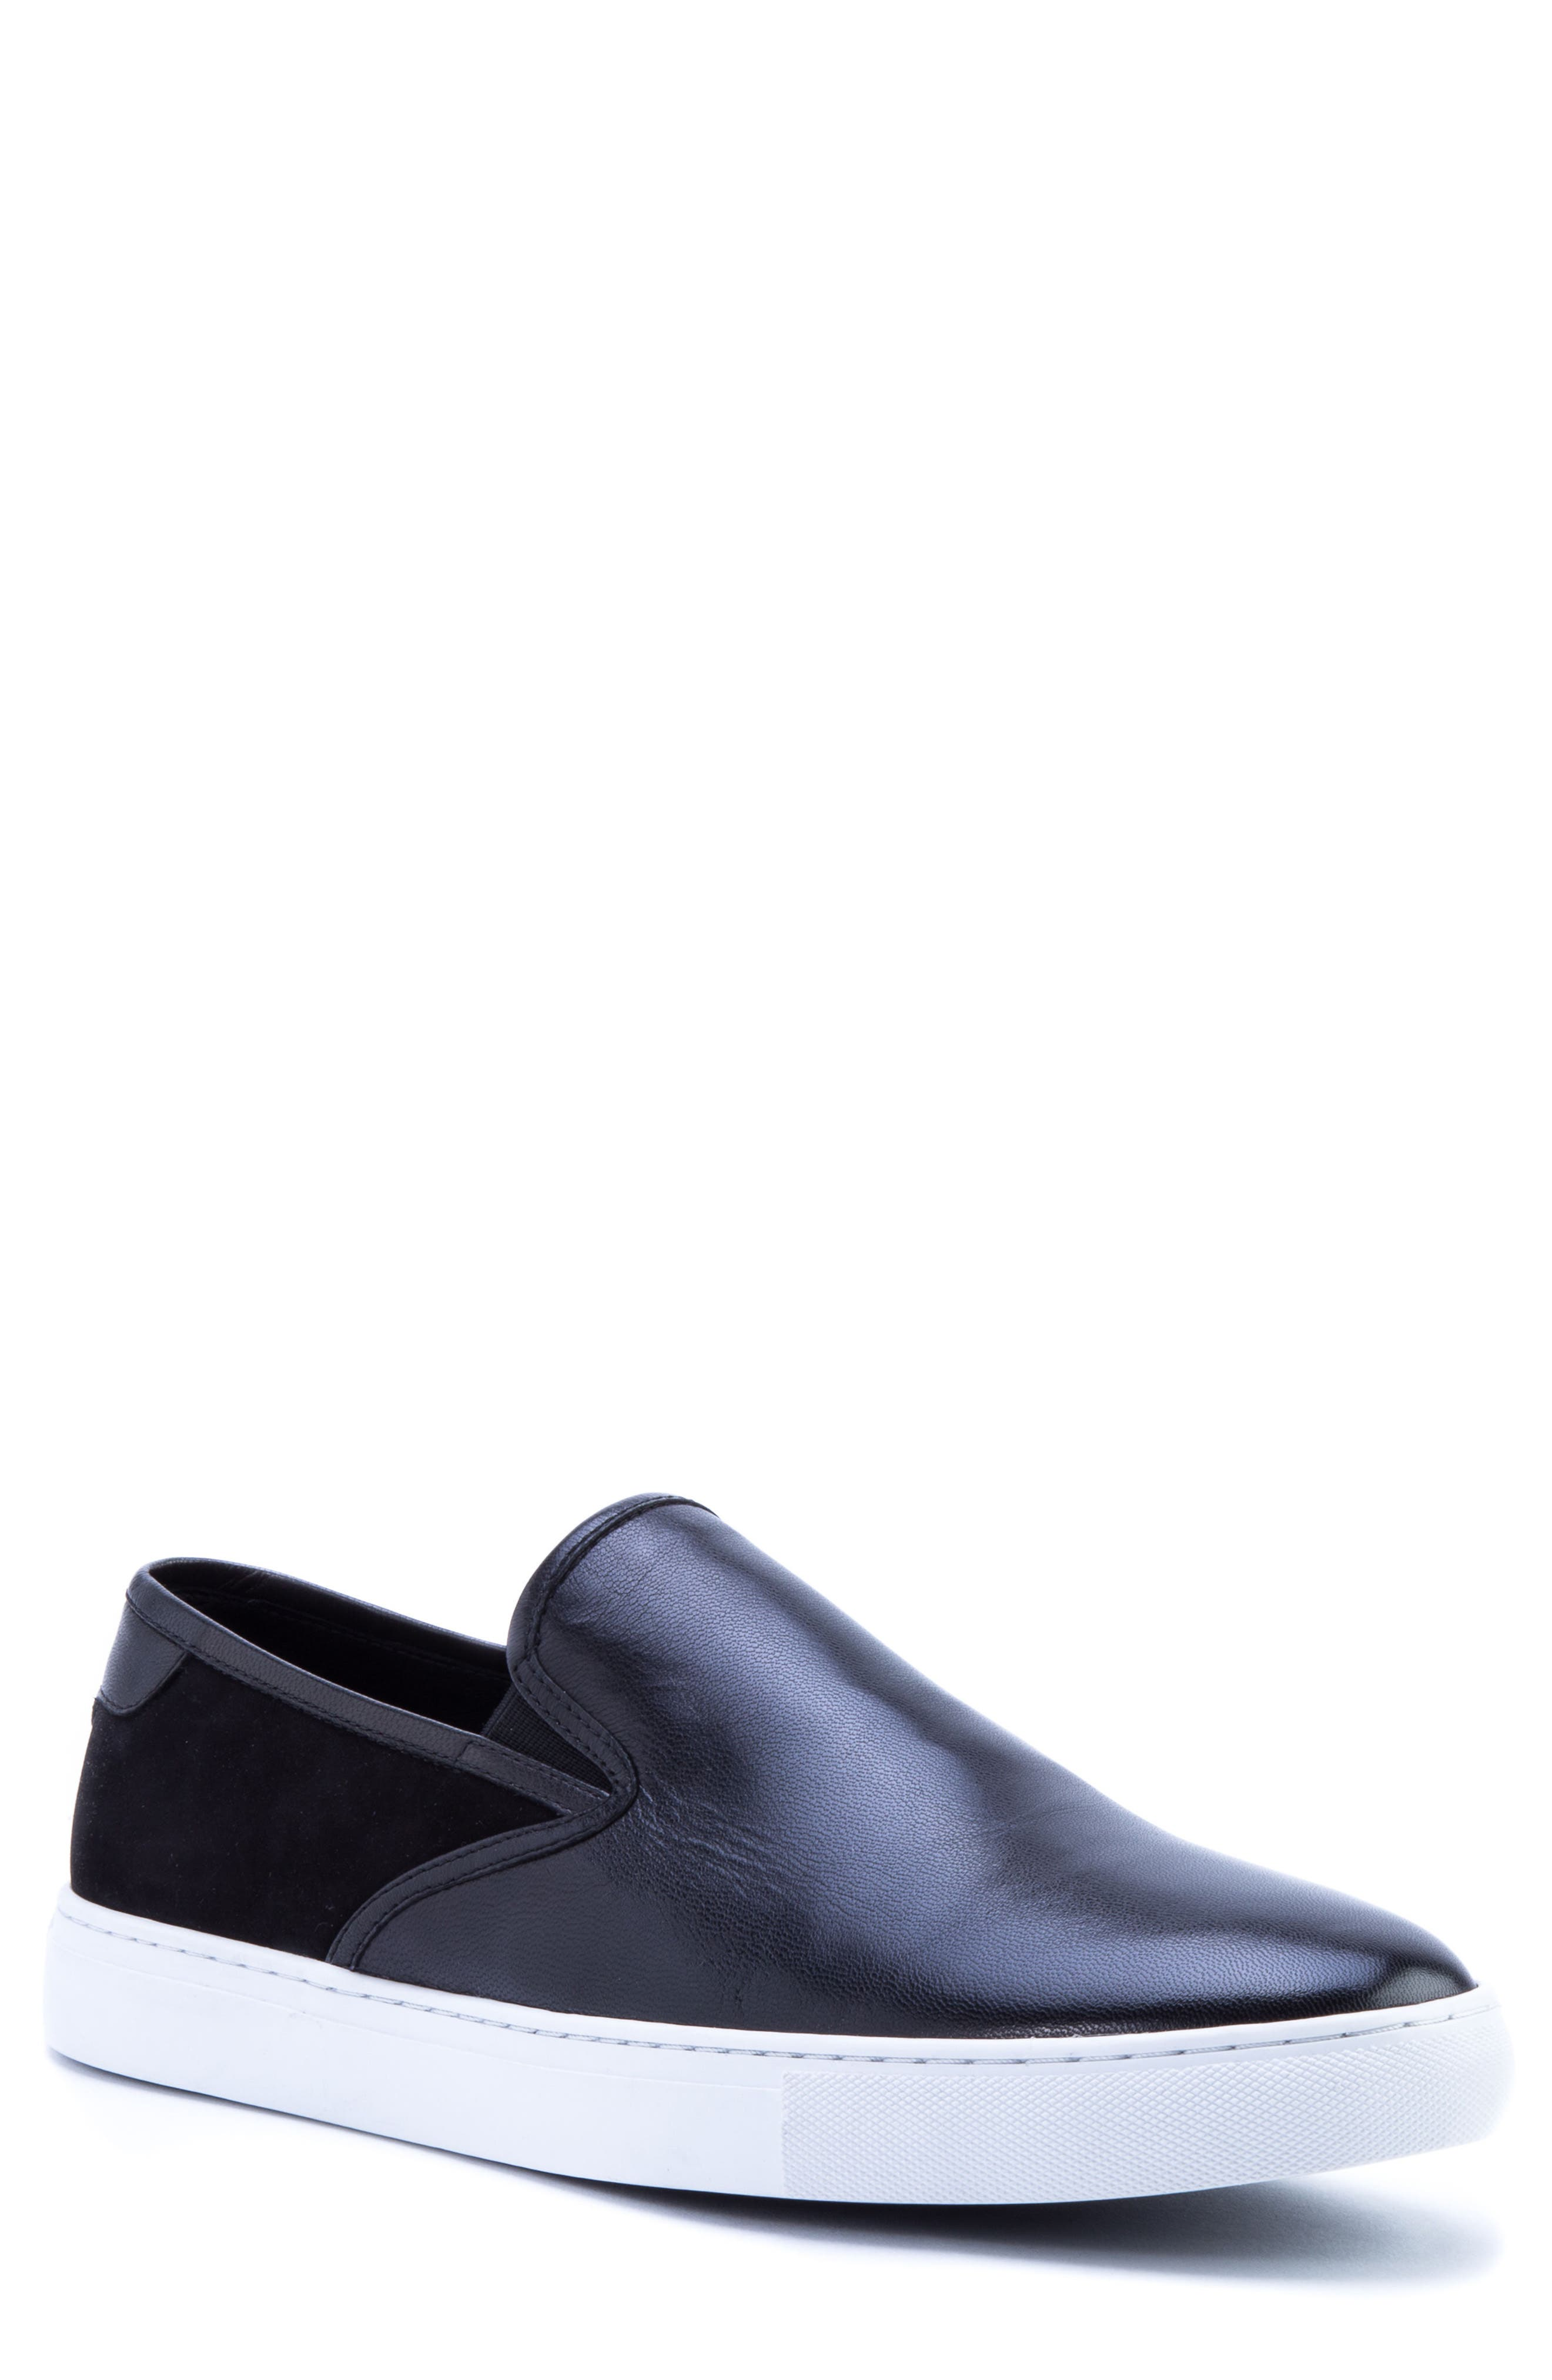 Zanzara Duchamps Slip-On Sneaker- Black